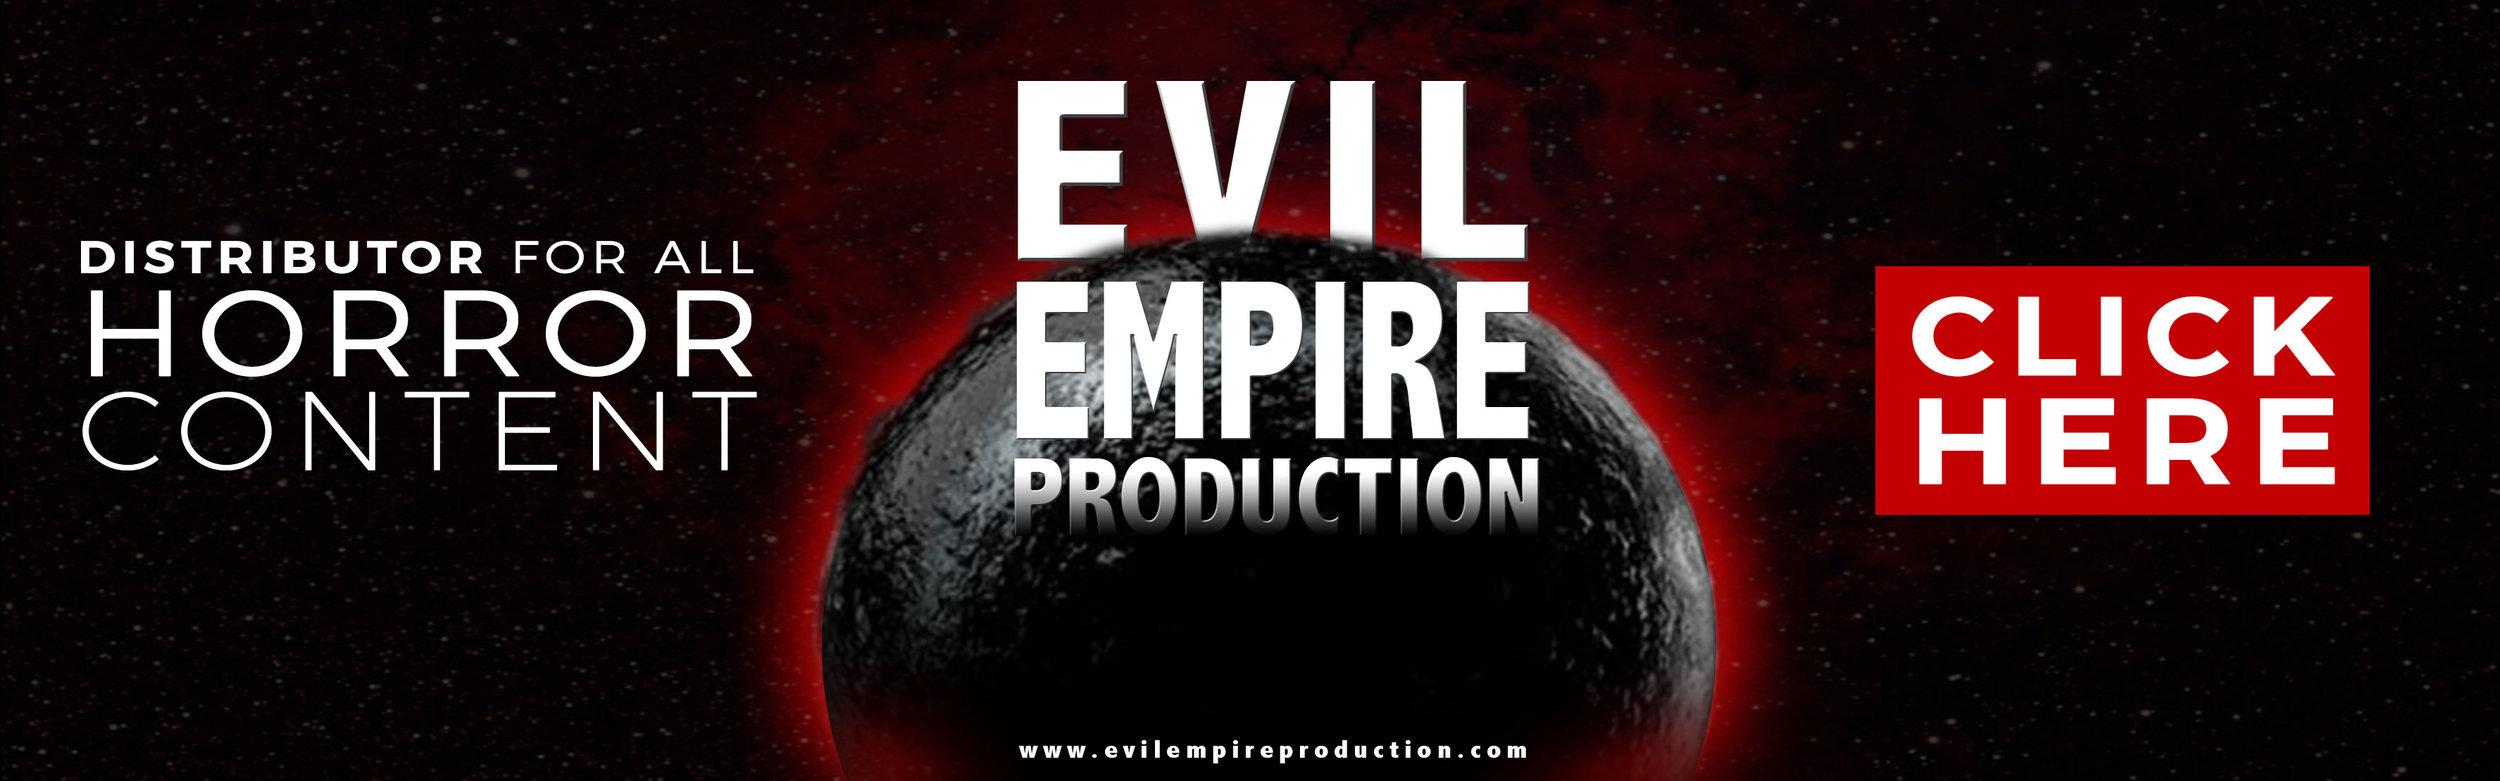 EEP-AD-horror-wide-banner.jpg